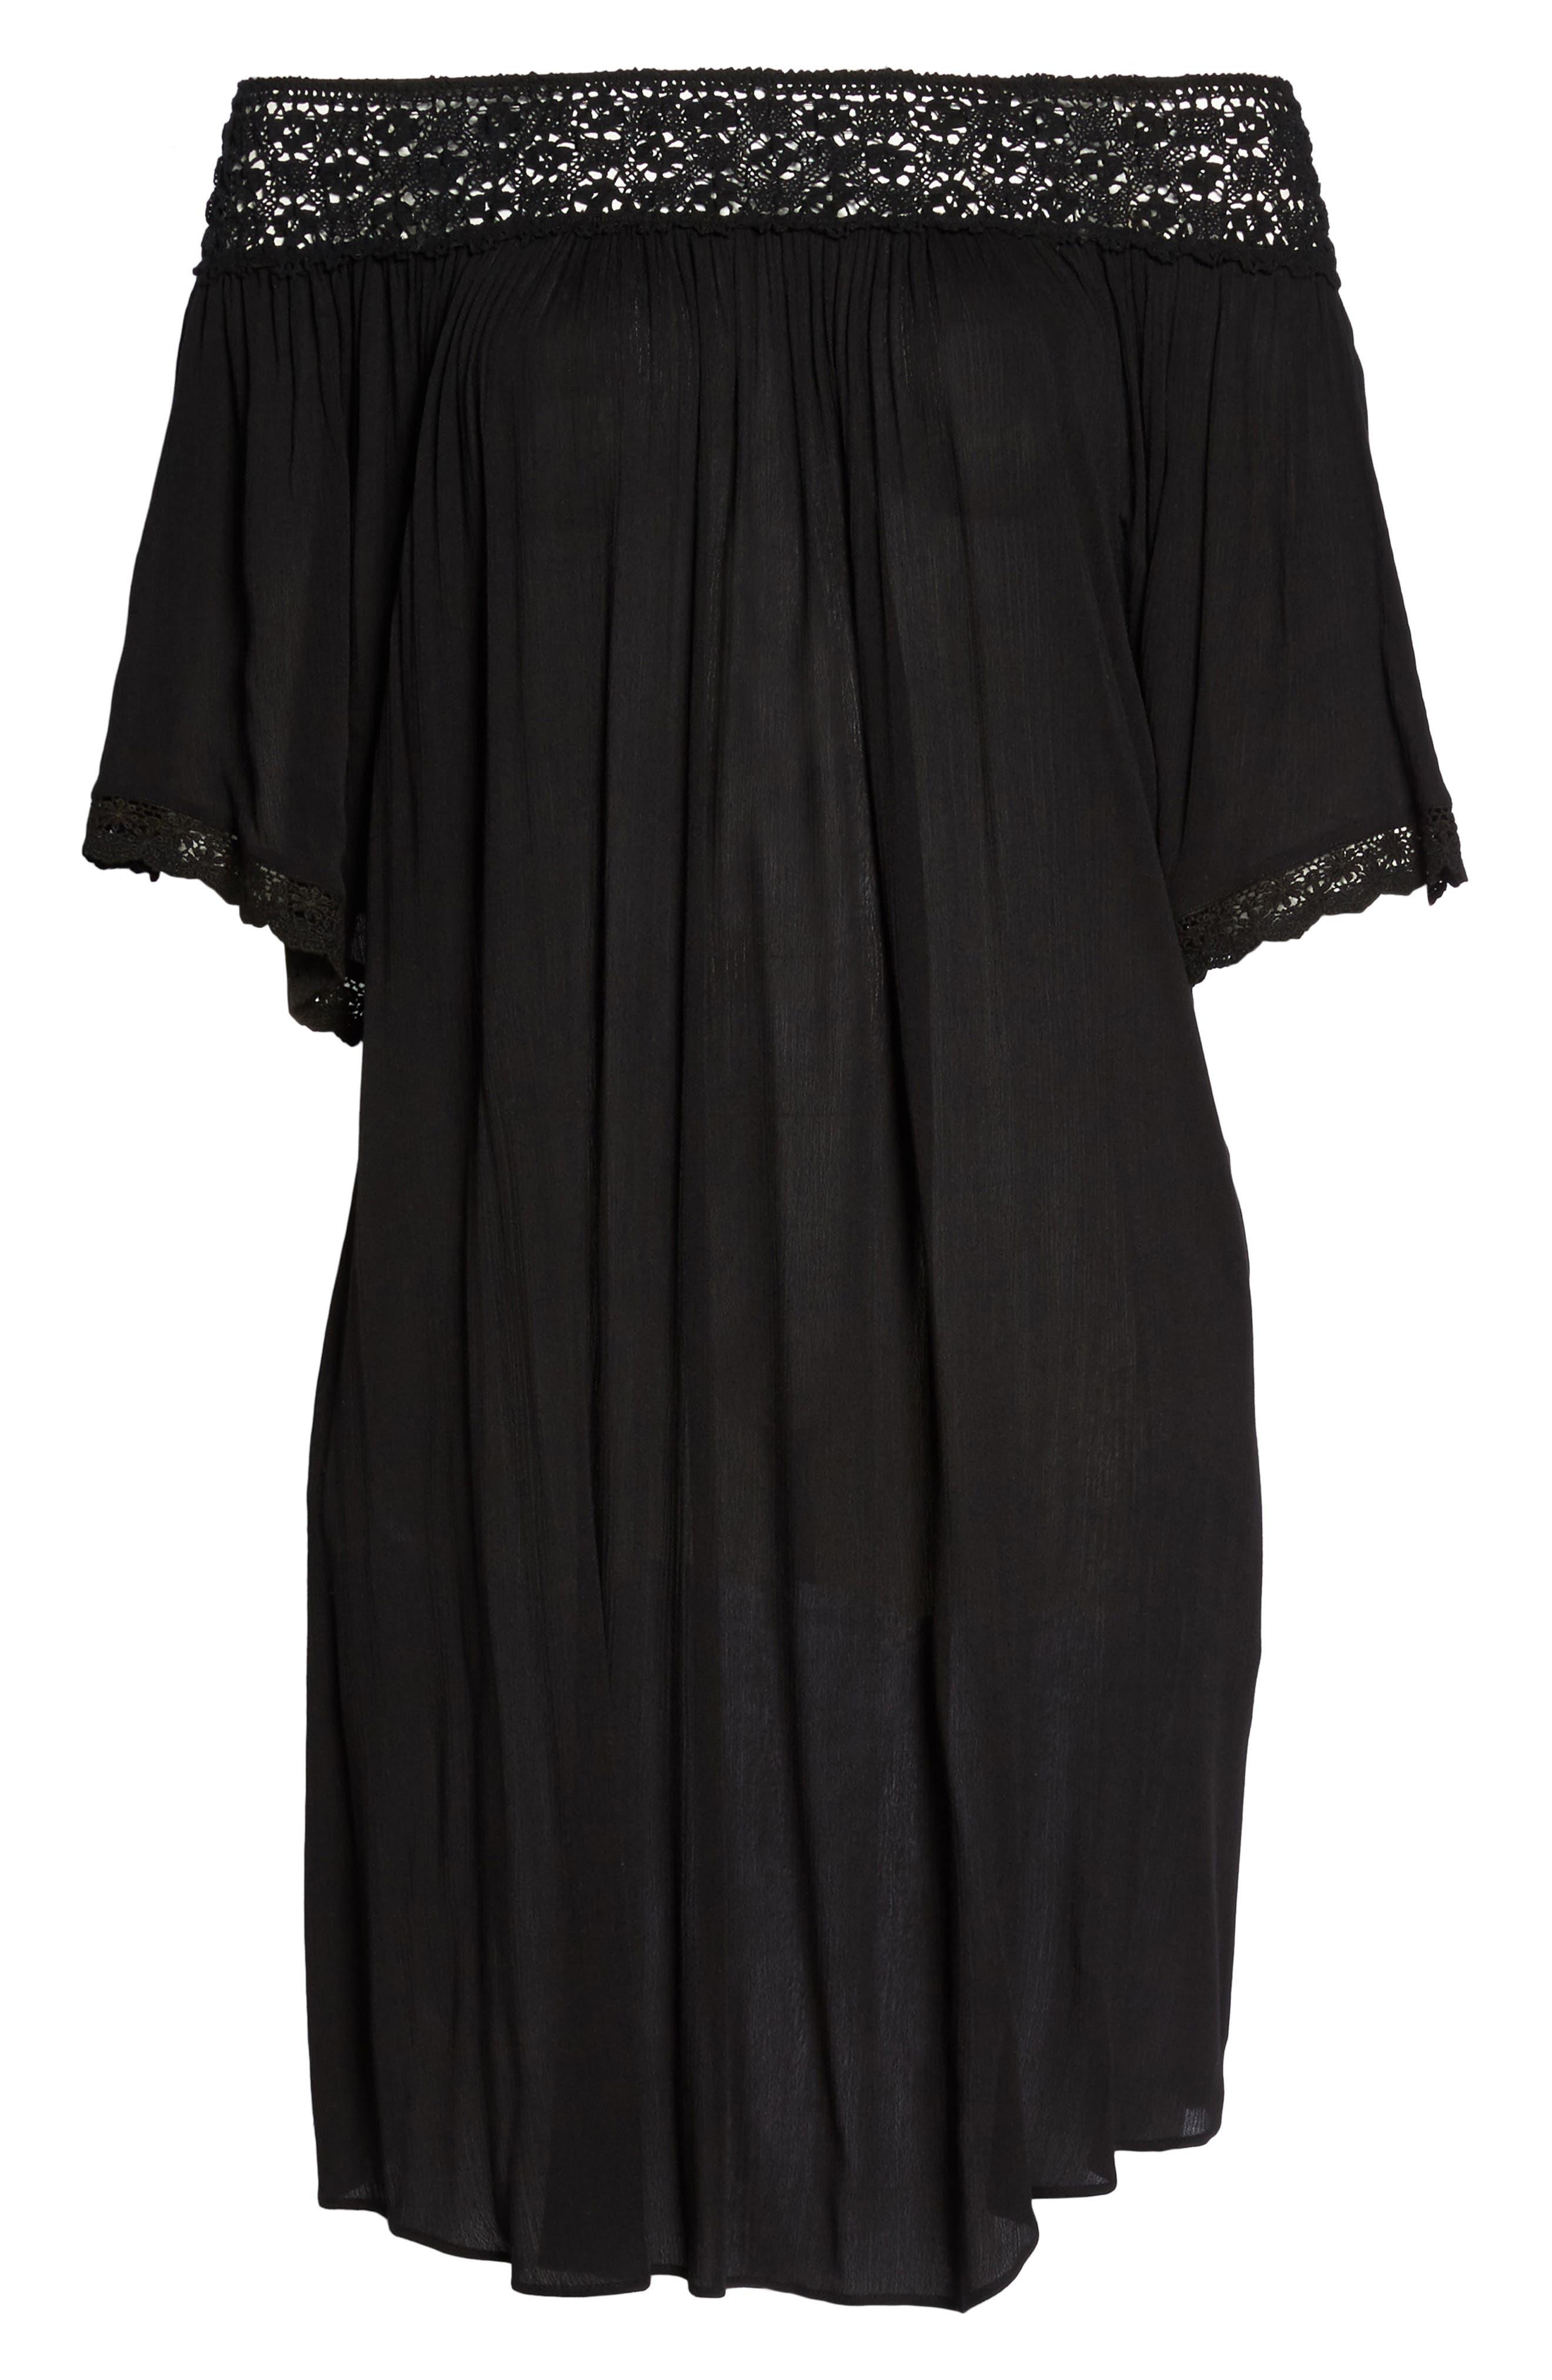 Rimini Crochet Cover-Up Dress,                             Alternate thumbnail 6, color,                             001